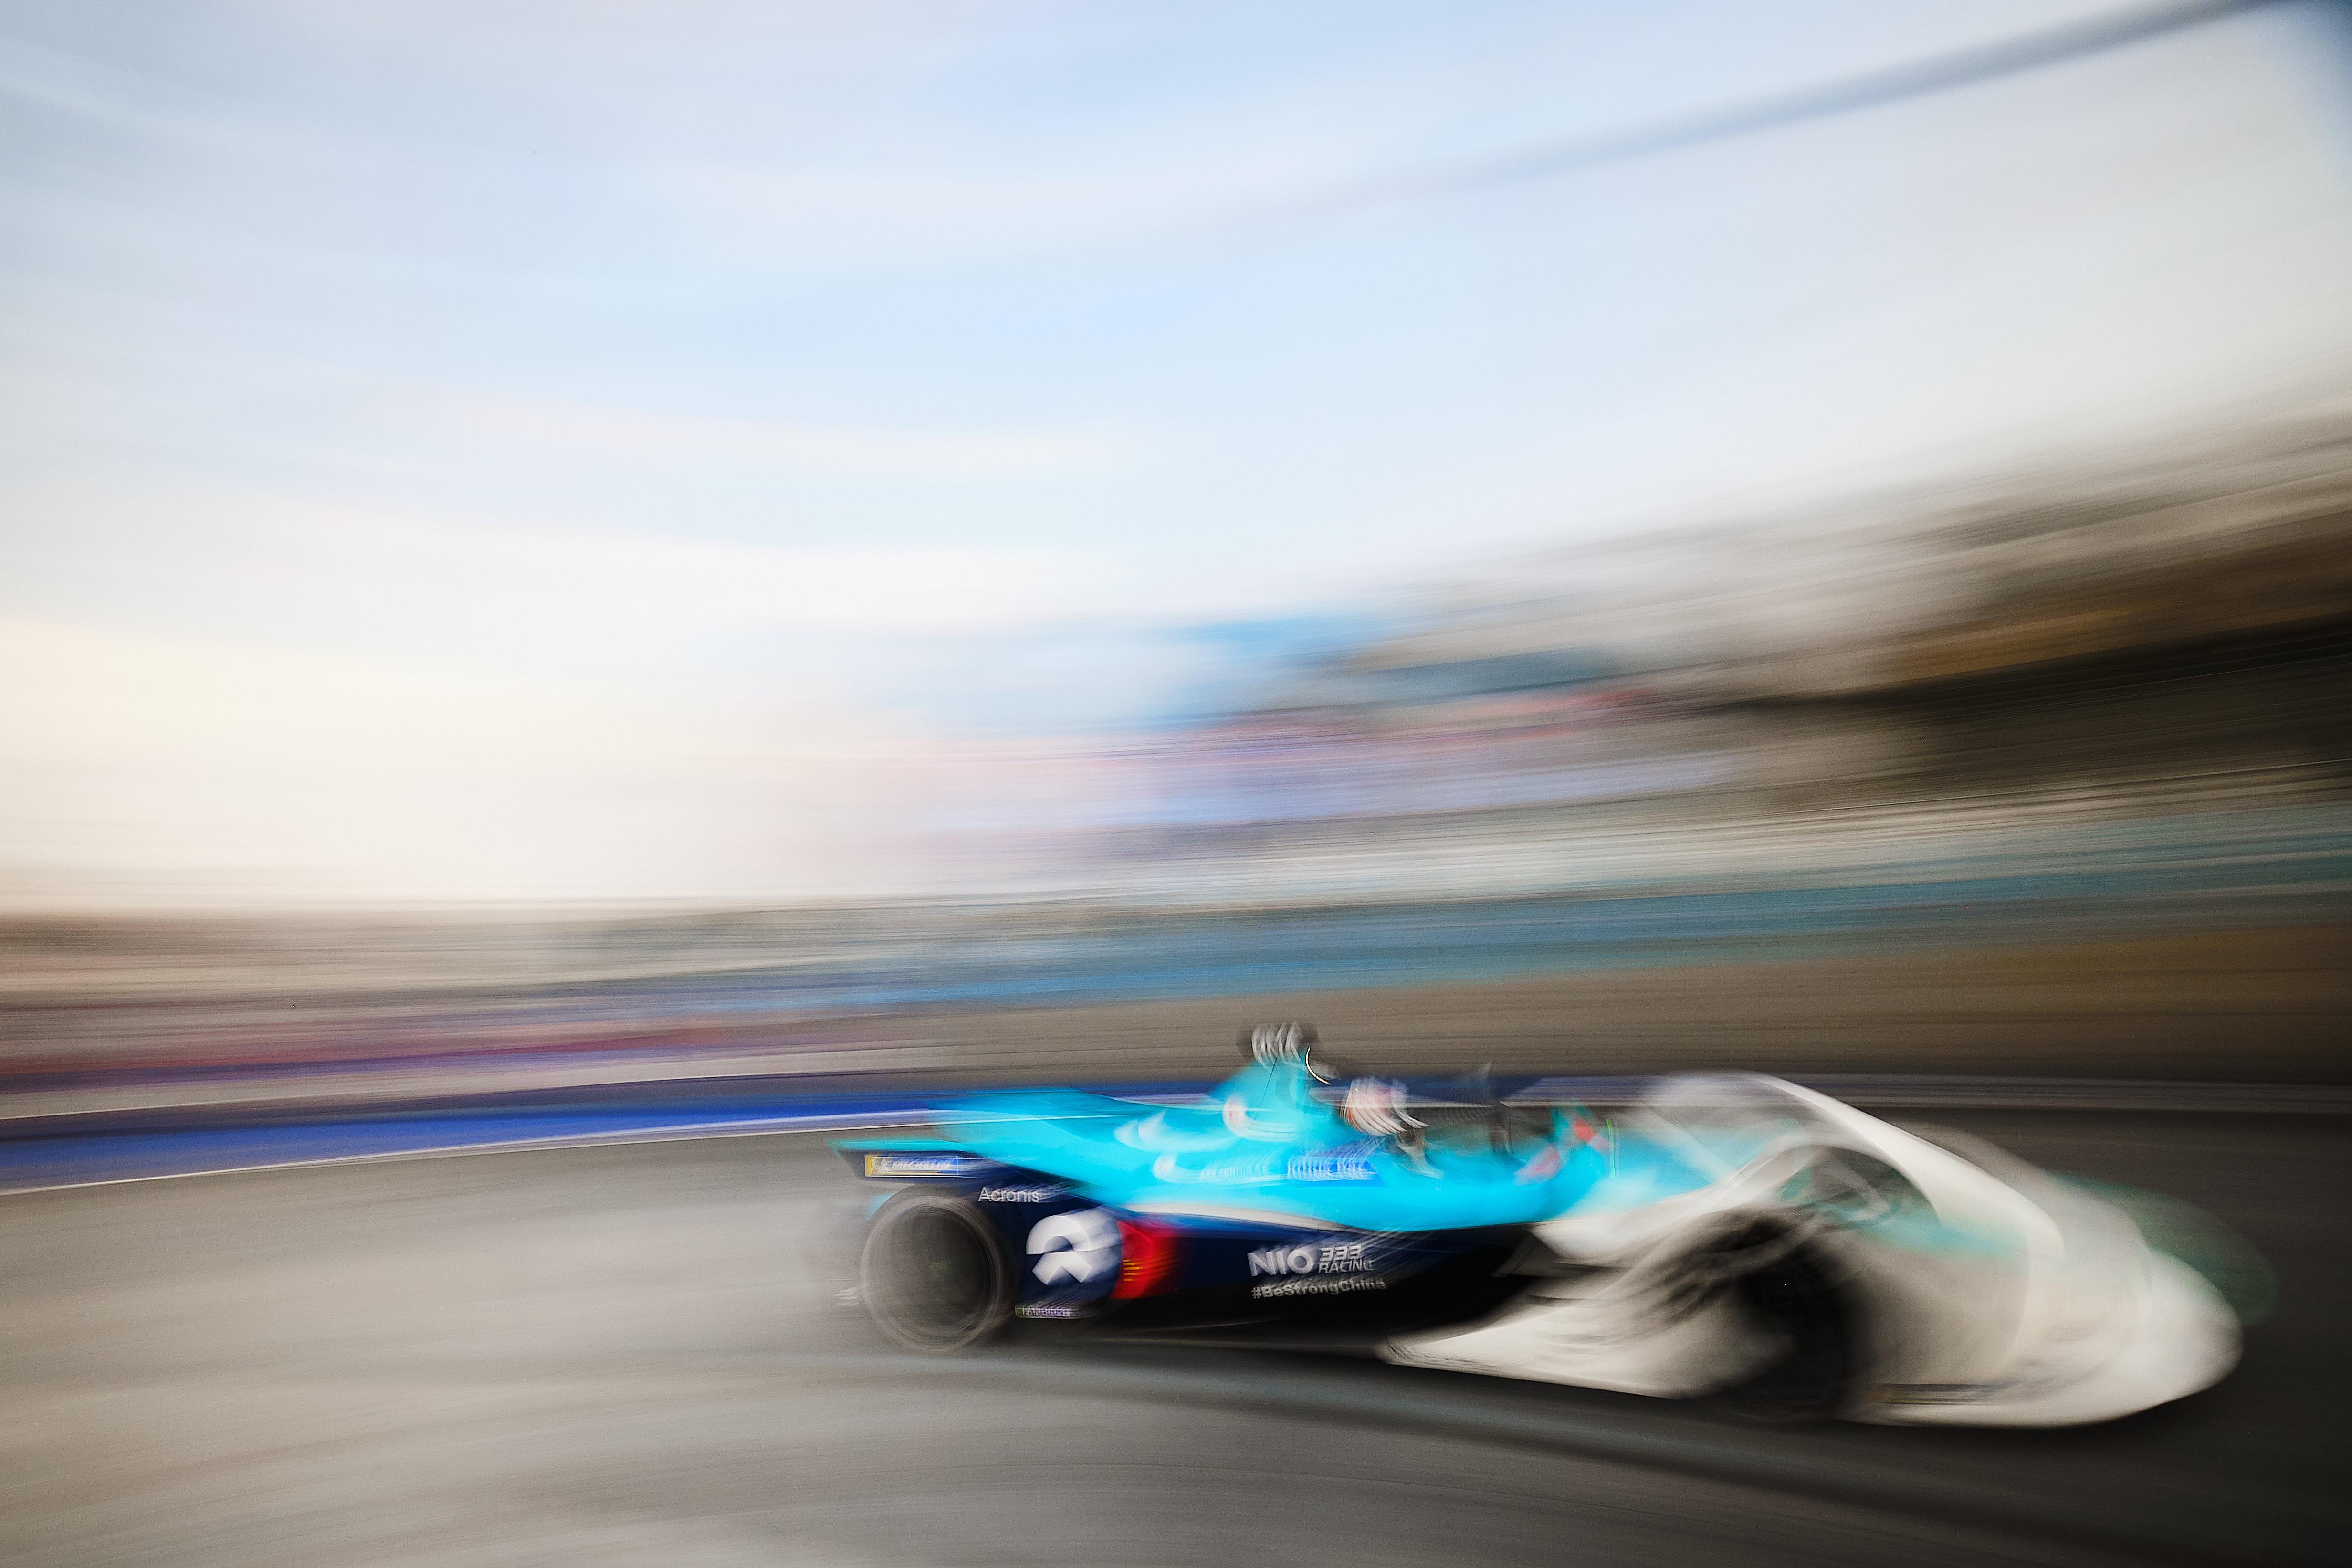 Ma Qing Hua NIO333 Mexico Formula E 2020